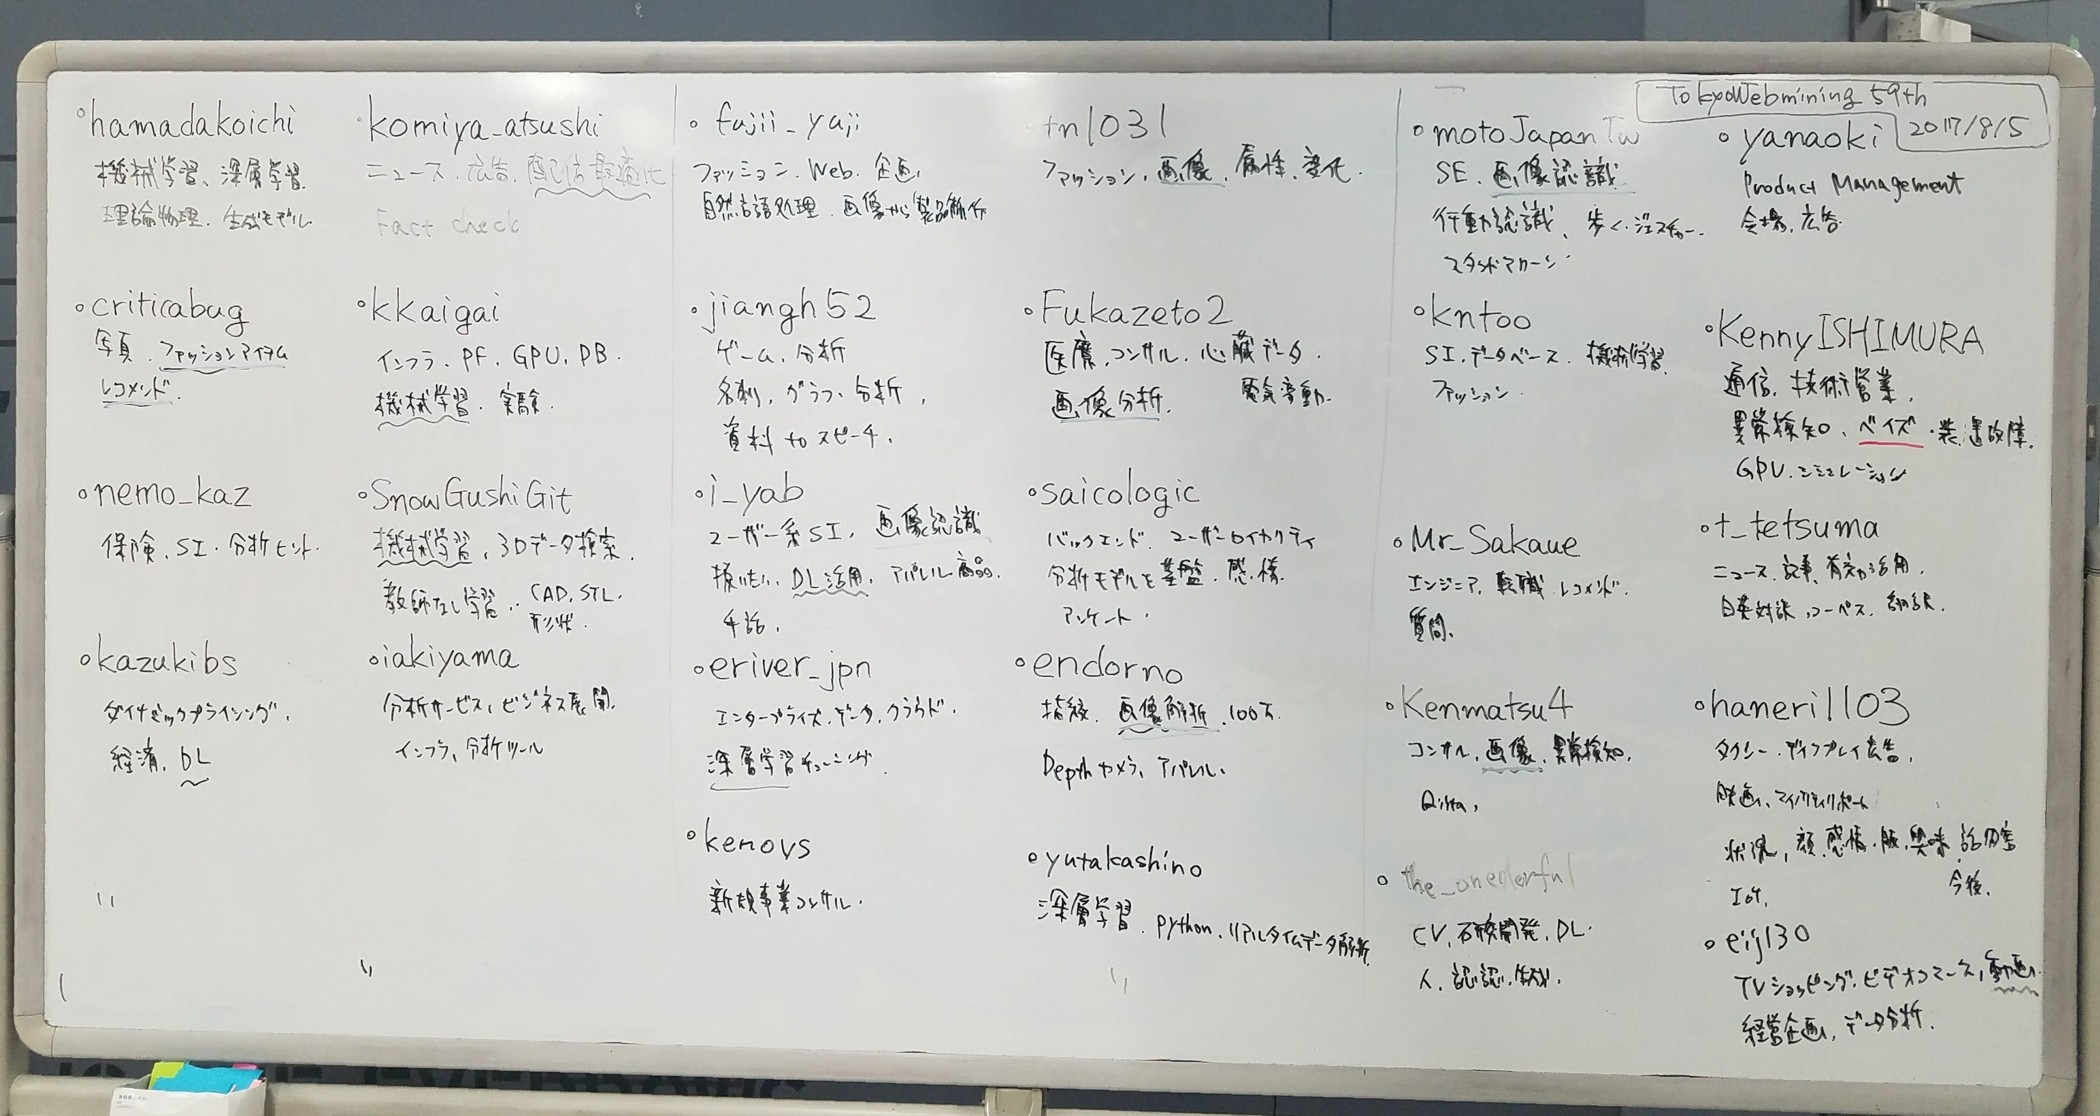 f:id:hamadakoichi:20170805192216j:image